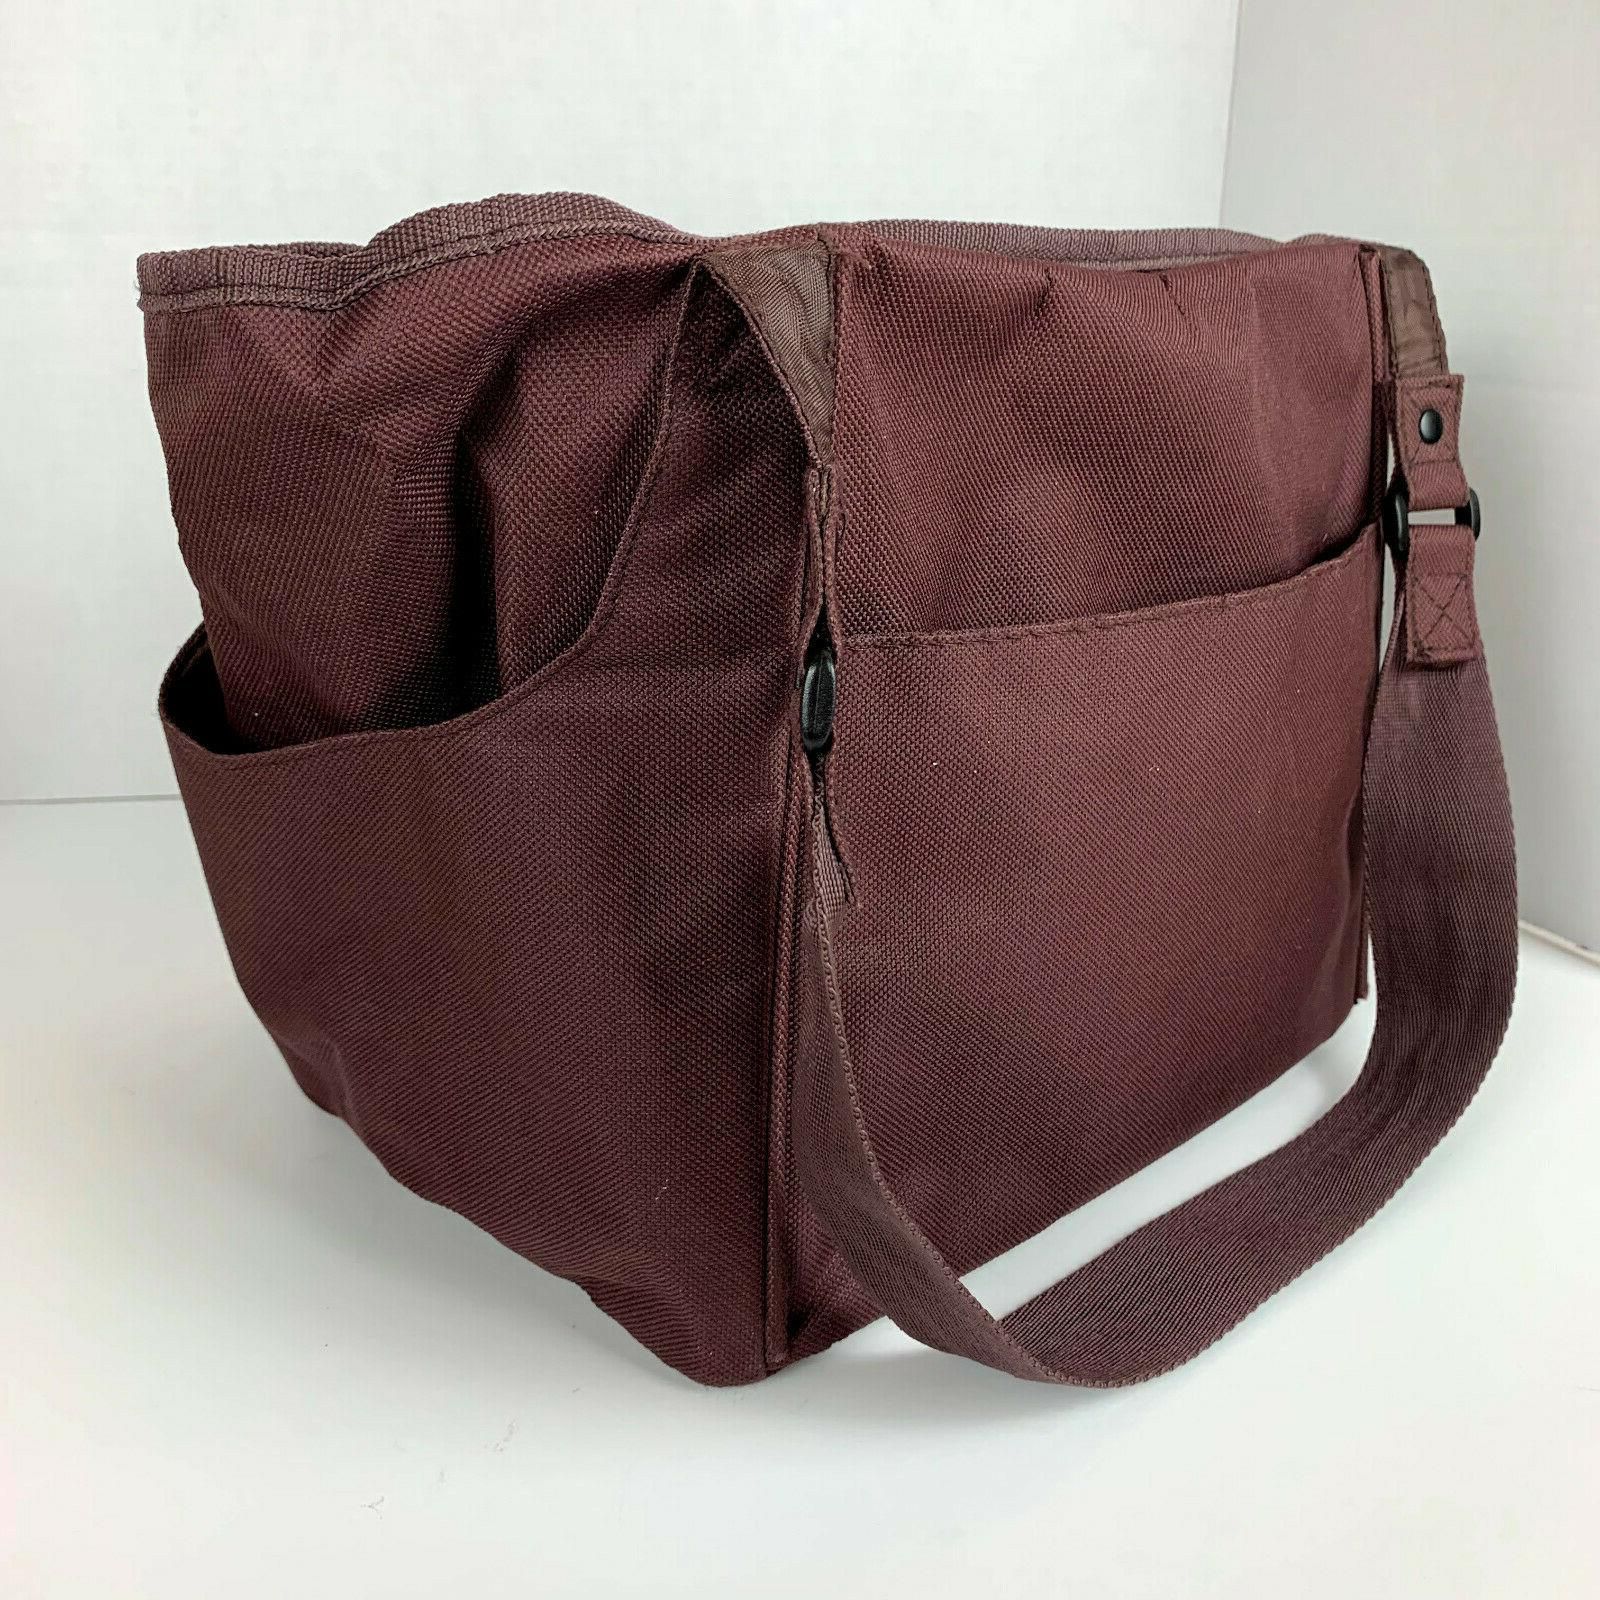 Cabela's Catch Gear Brown Bag Hunting Range On